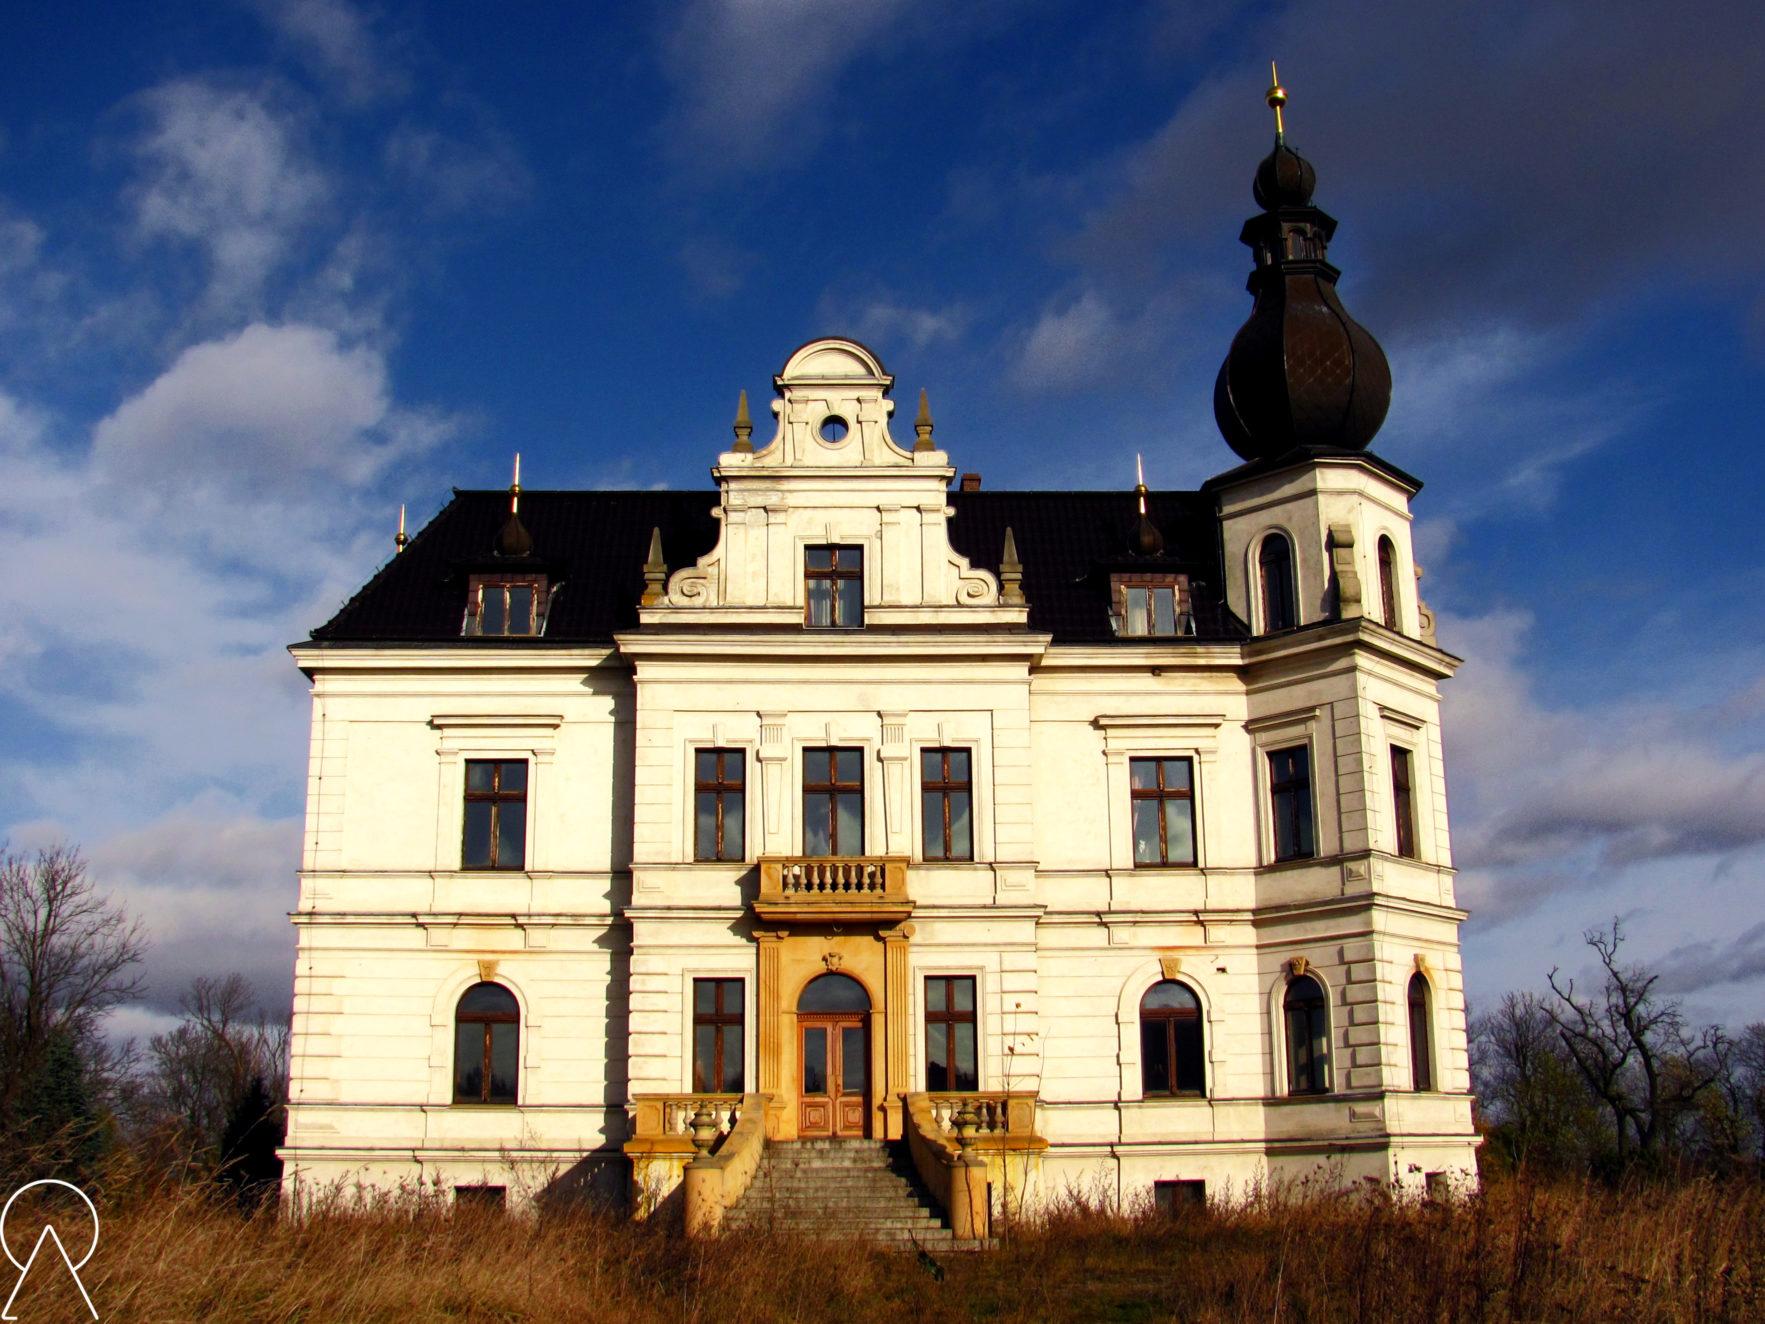 Pałac wBiskupicach Podgórnych